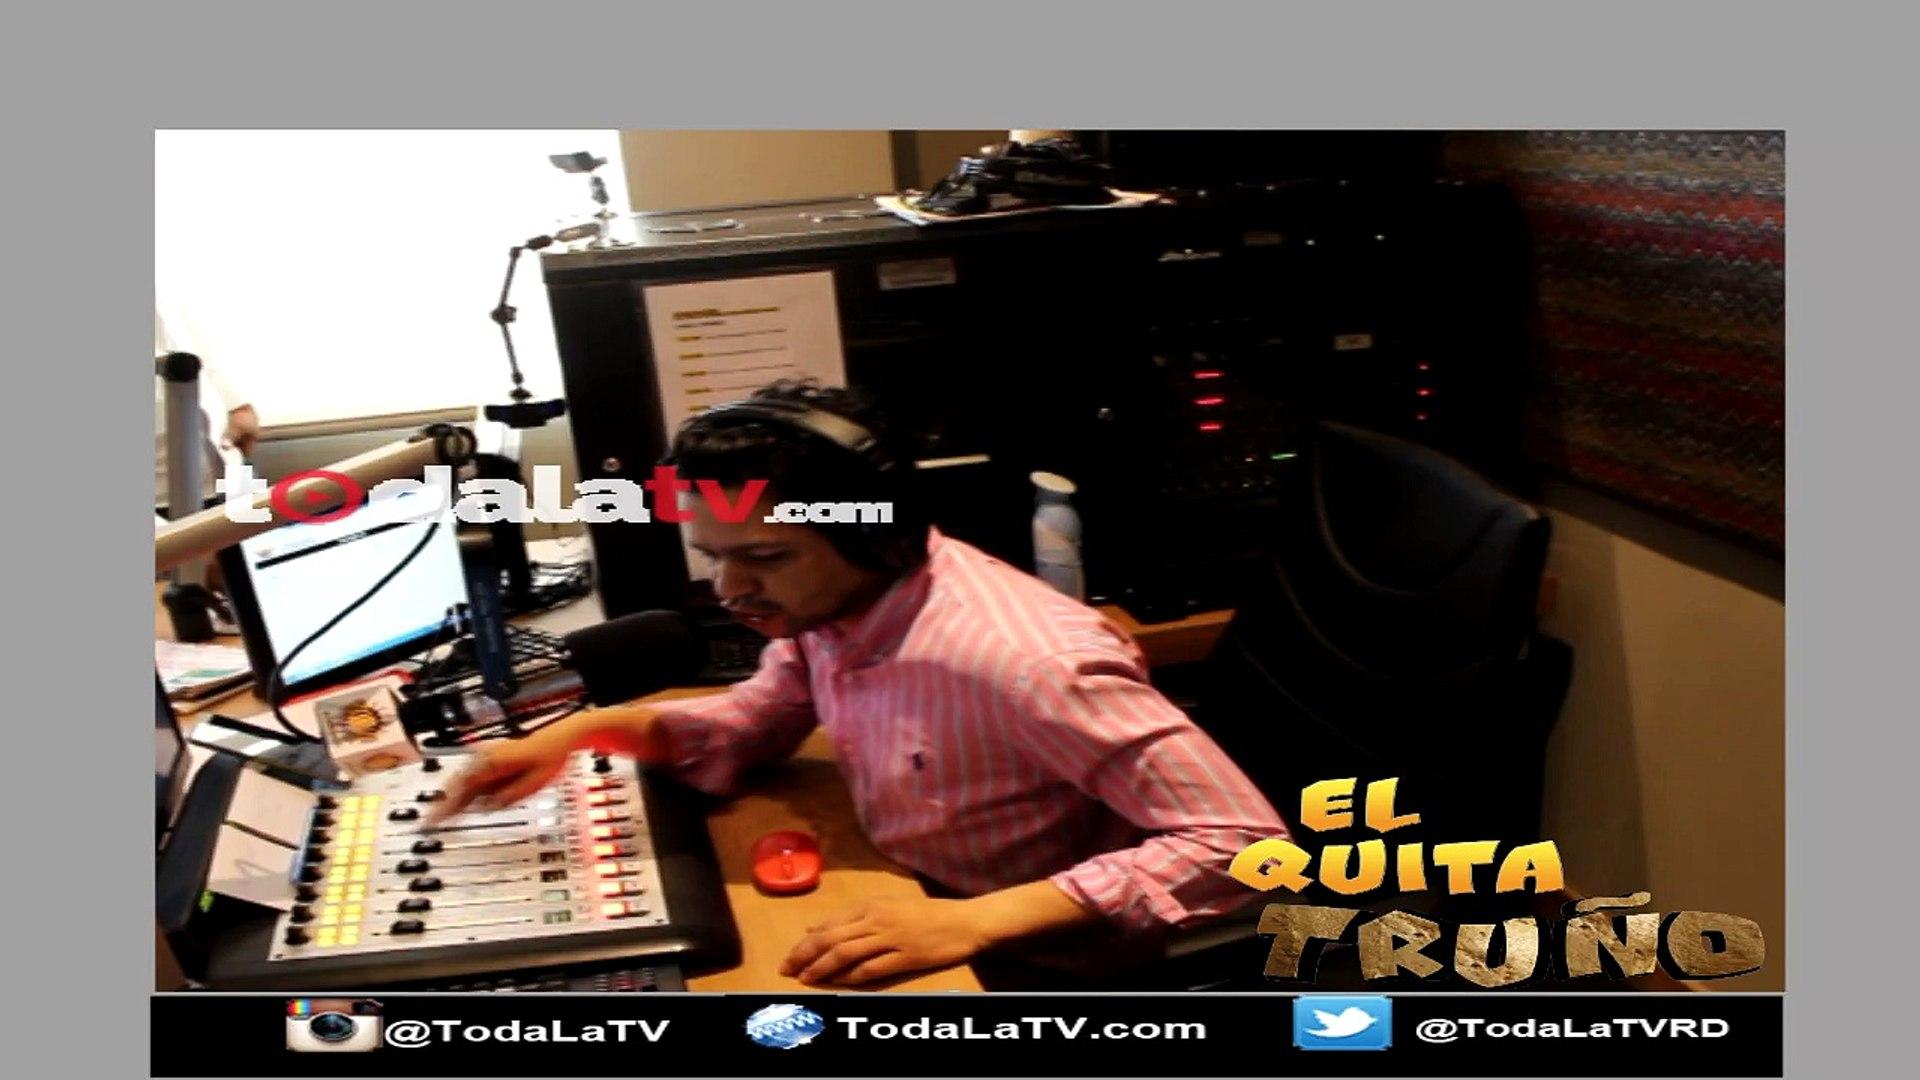 Entrevista al merenguero urbano Tony Banda Banda-El Quita Truno-Video